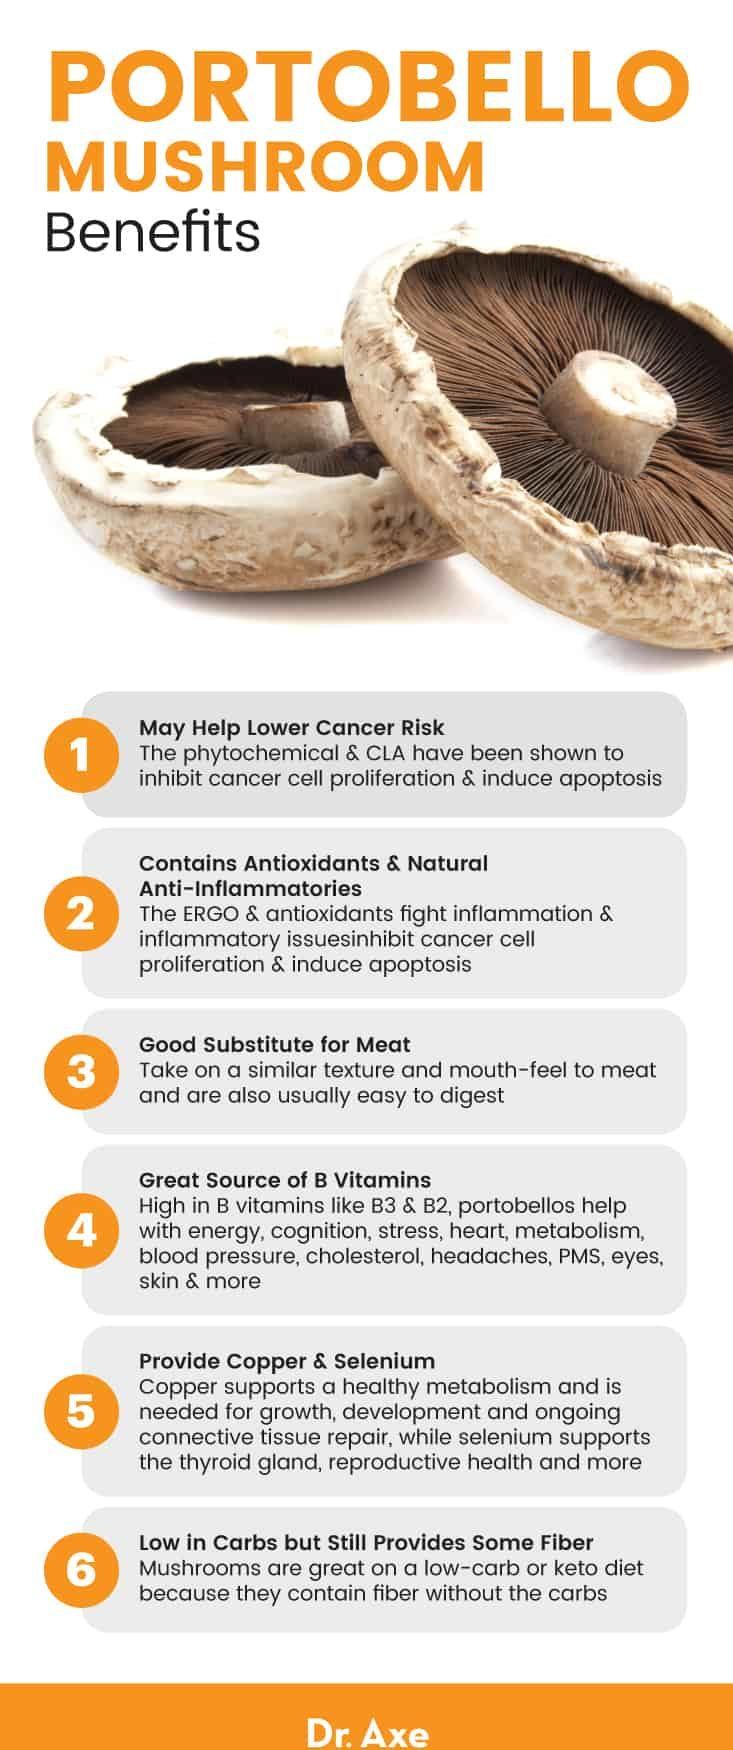 Portobello mushroom benefits - Dr. Axe